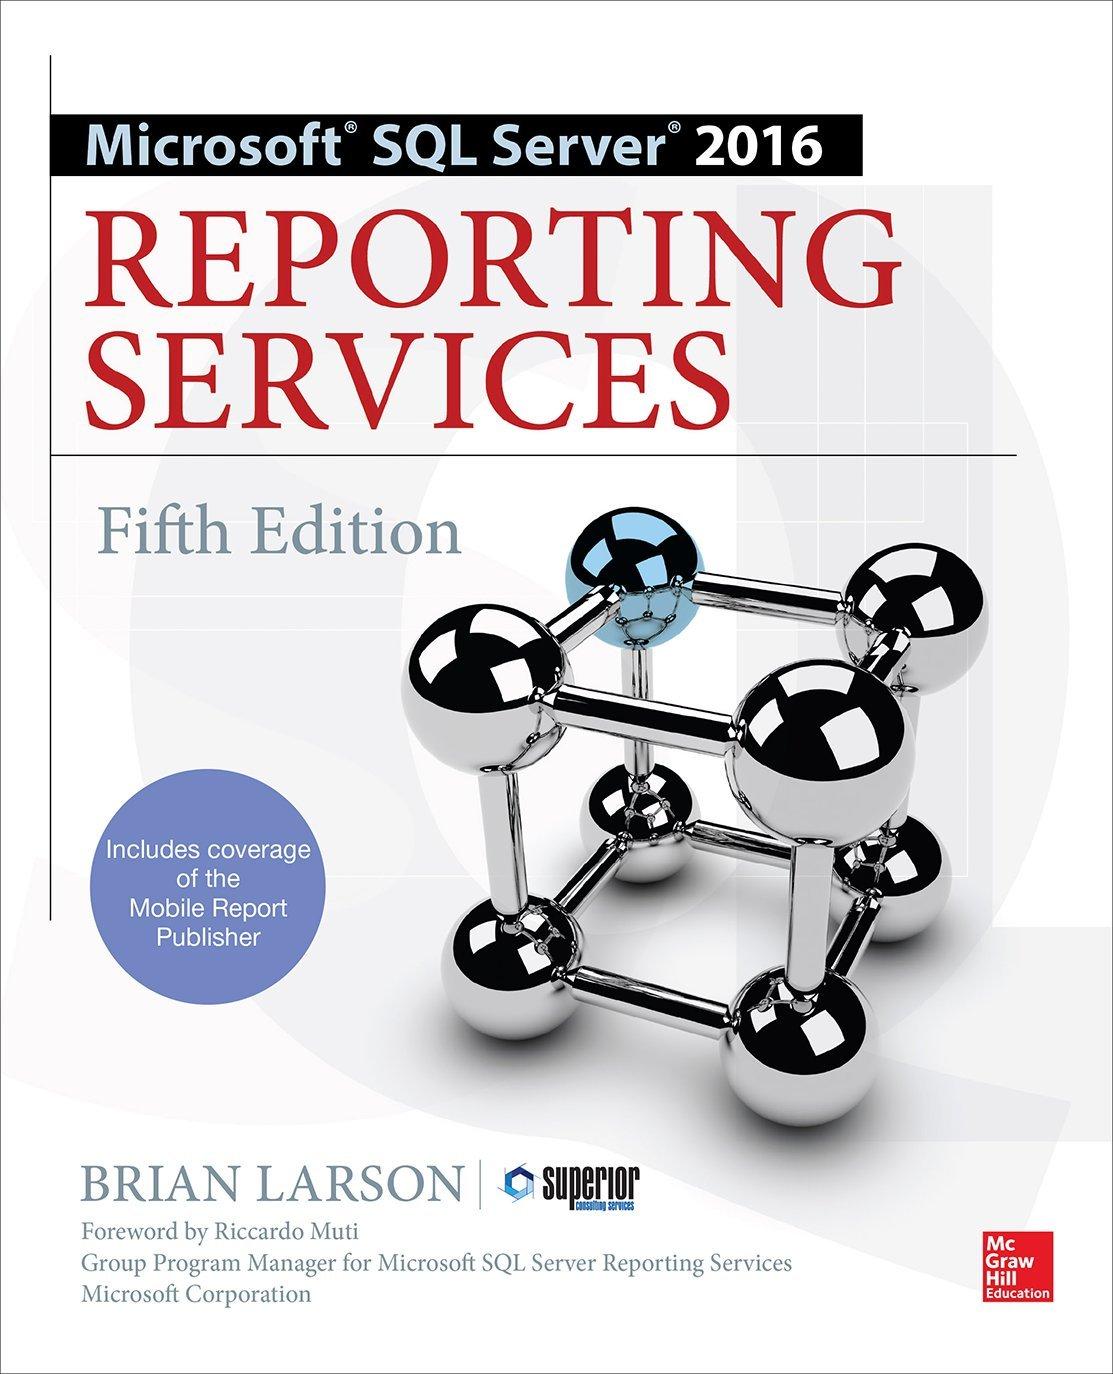 amazon microsoft sql server 2016 reporting services fifth edition